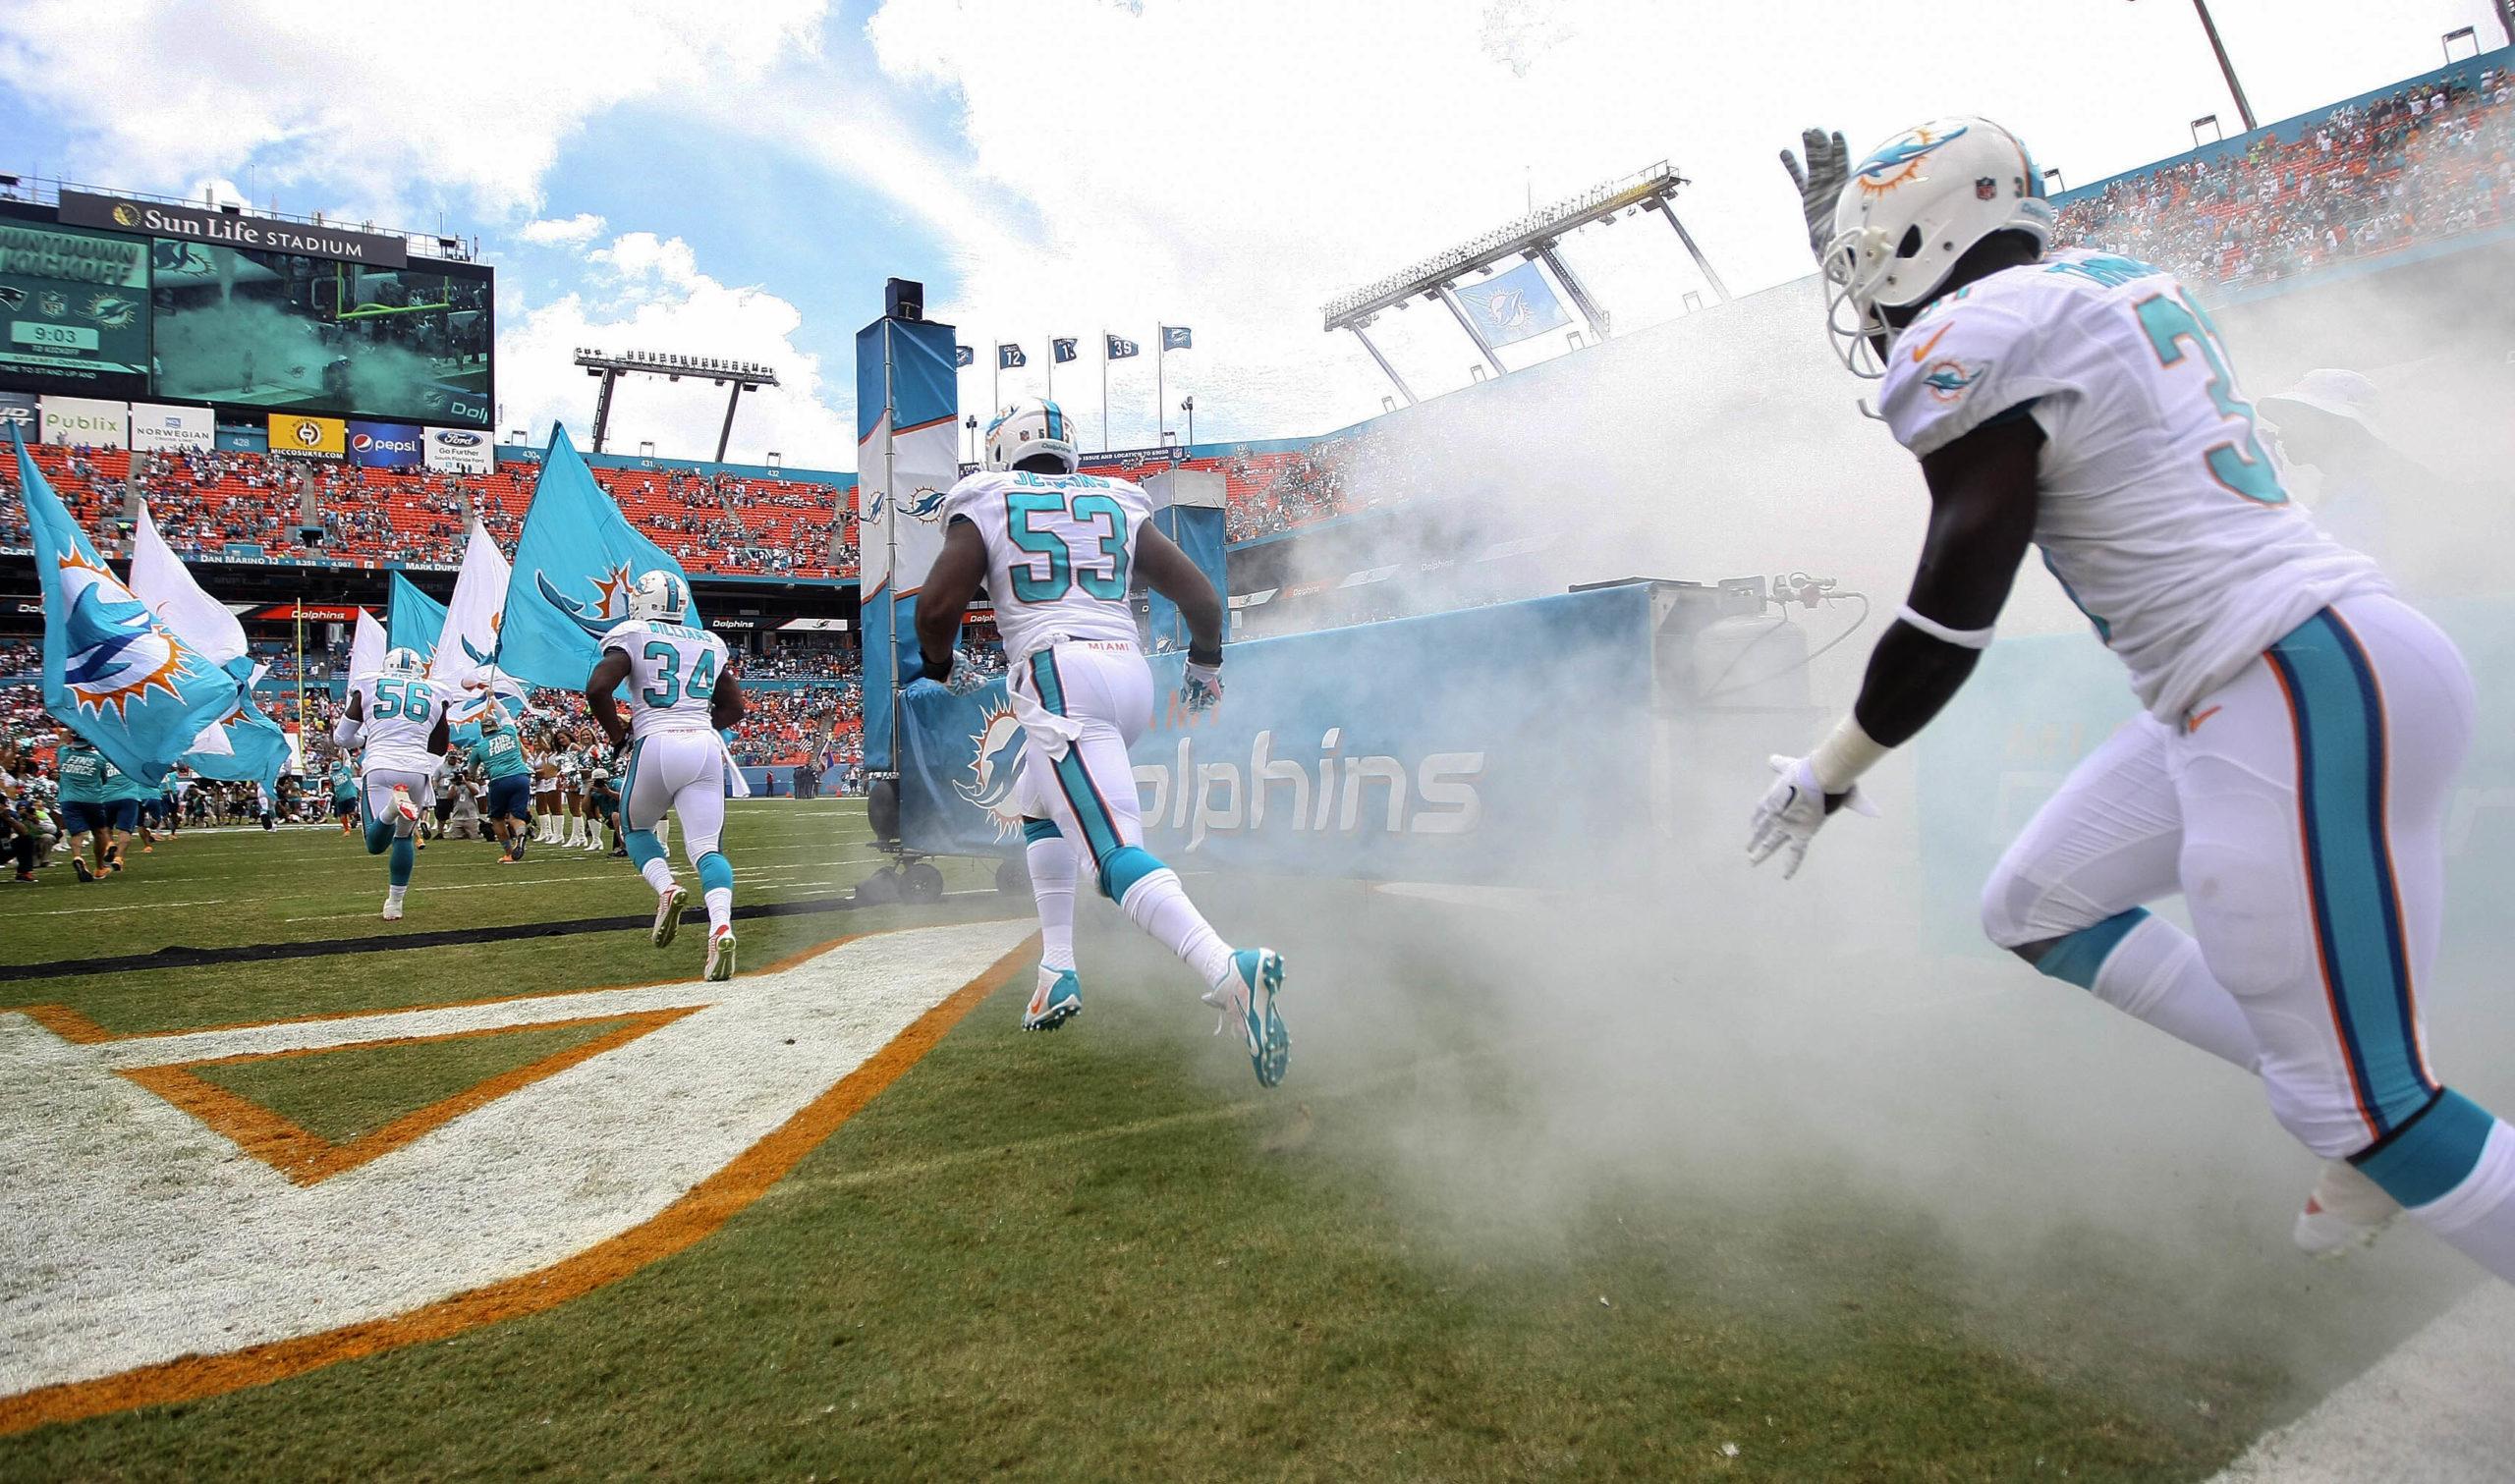 Miami Dolphins entry